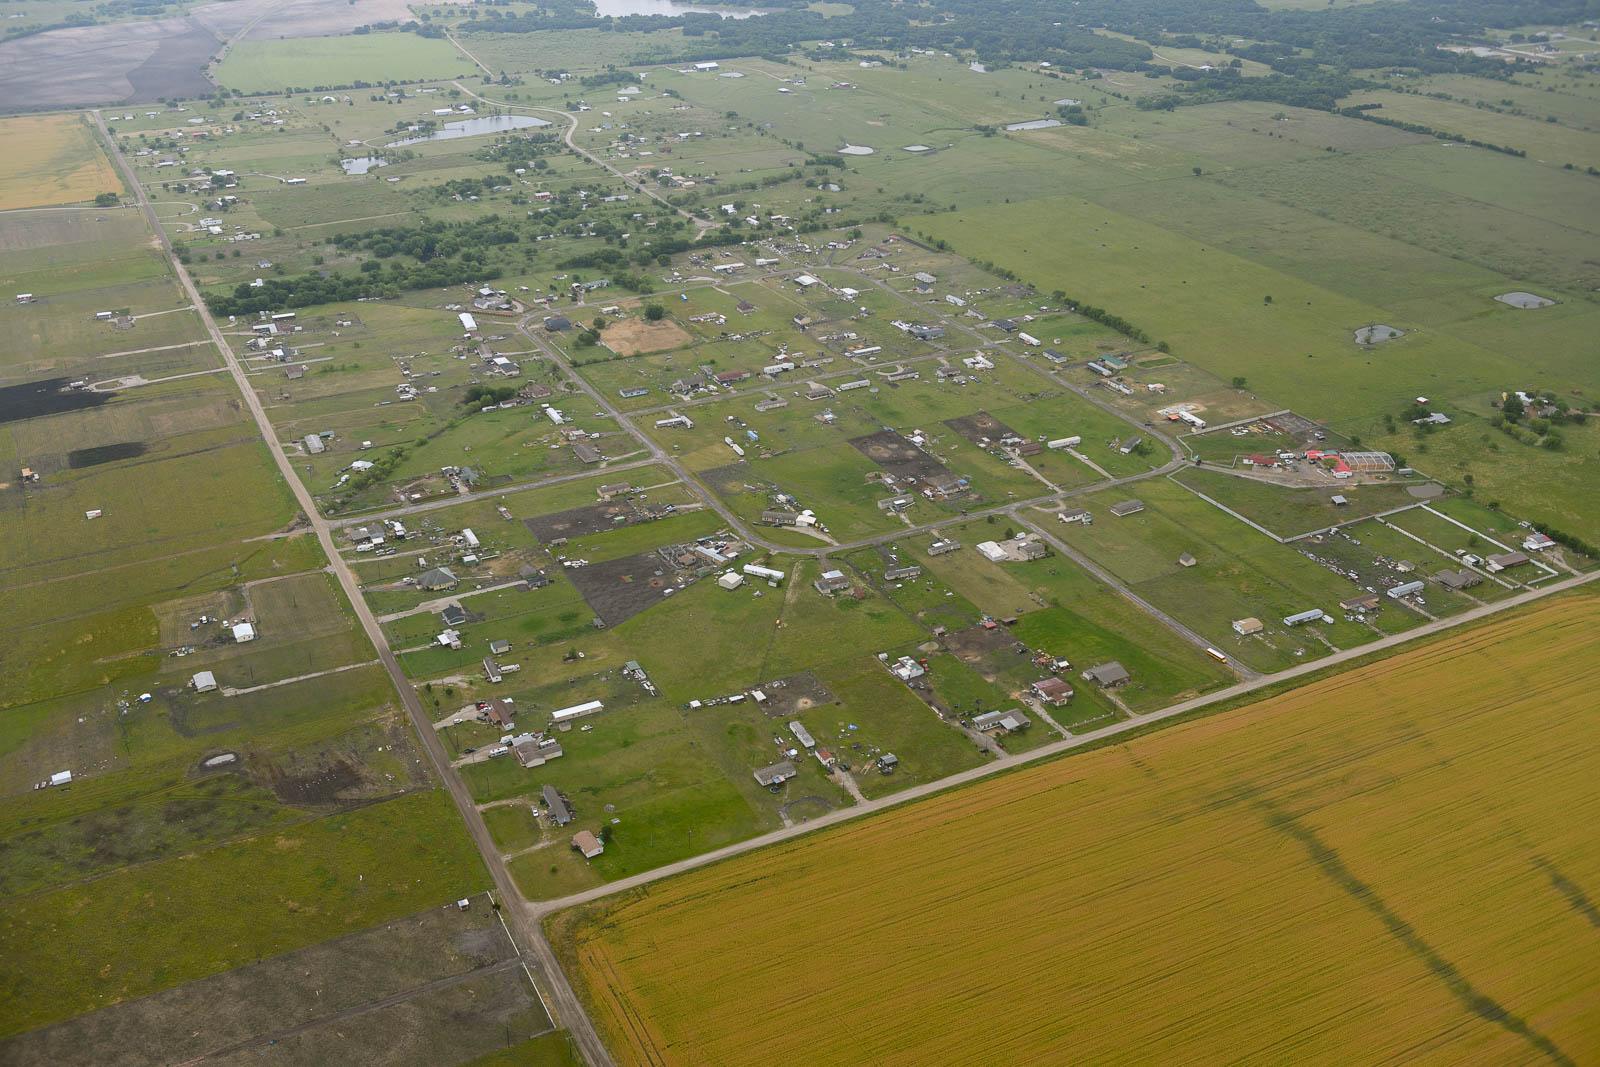 Not too pretty suburbs of Kaufman, Texas